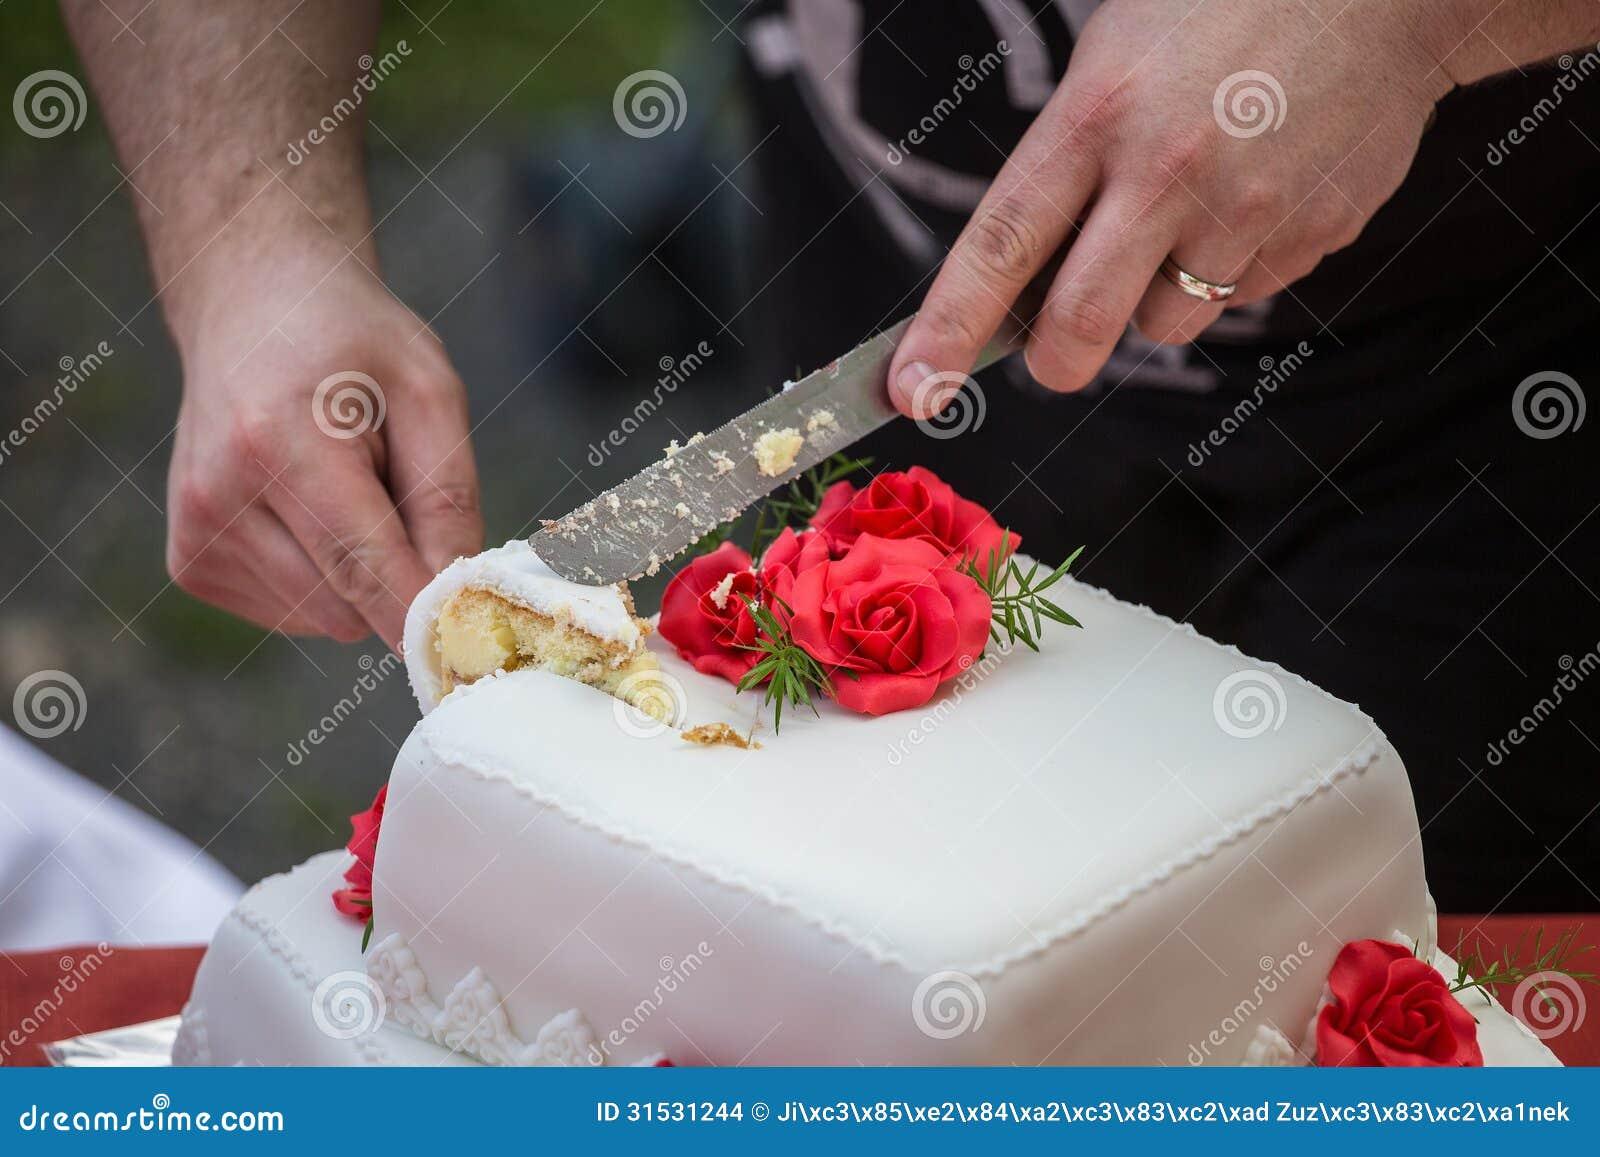 cutting the wedding cake stock images image 31531244. Black Bedroom Furniture Sets. Home Design Ideas